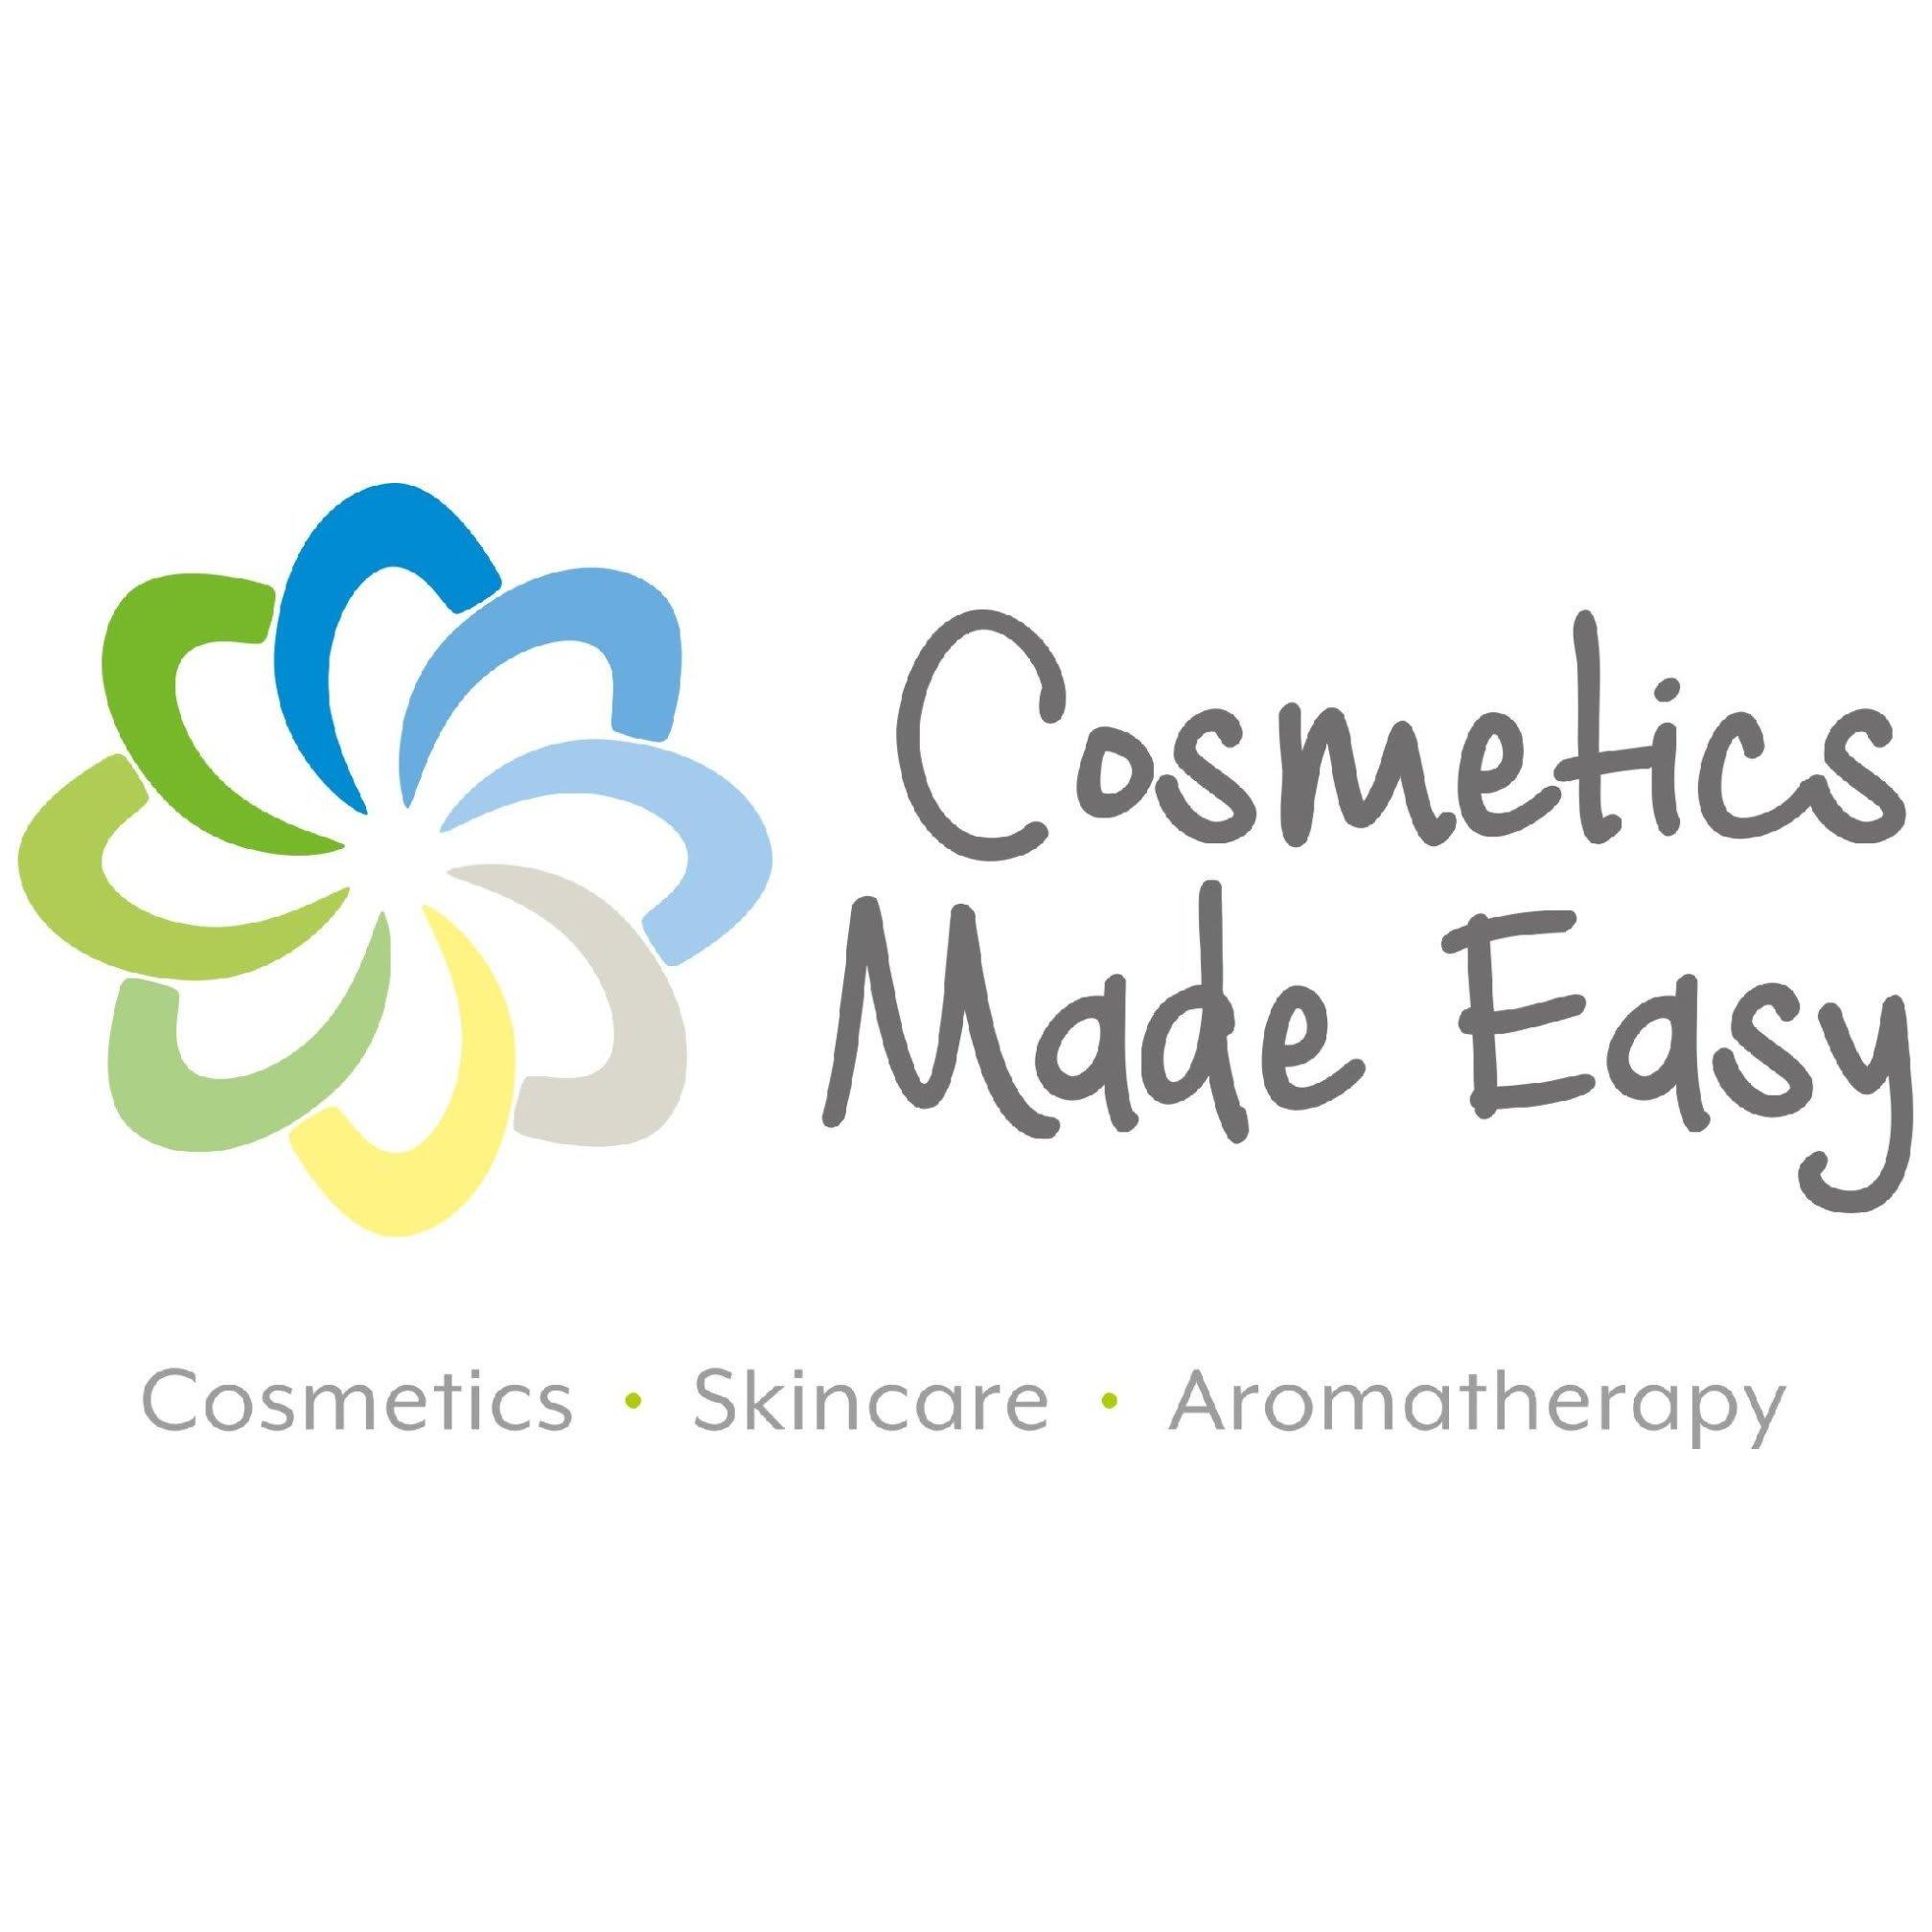 Cosmetics Made Easy - Cardiff, South Glamorgan CF11 9NJ - 02920 140130 | ShowMeLocal.com